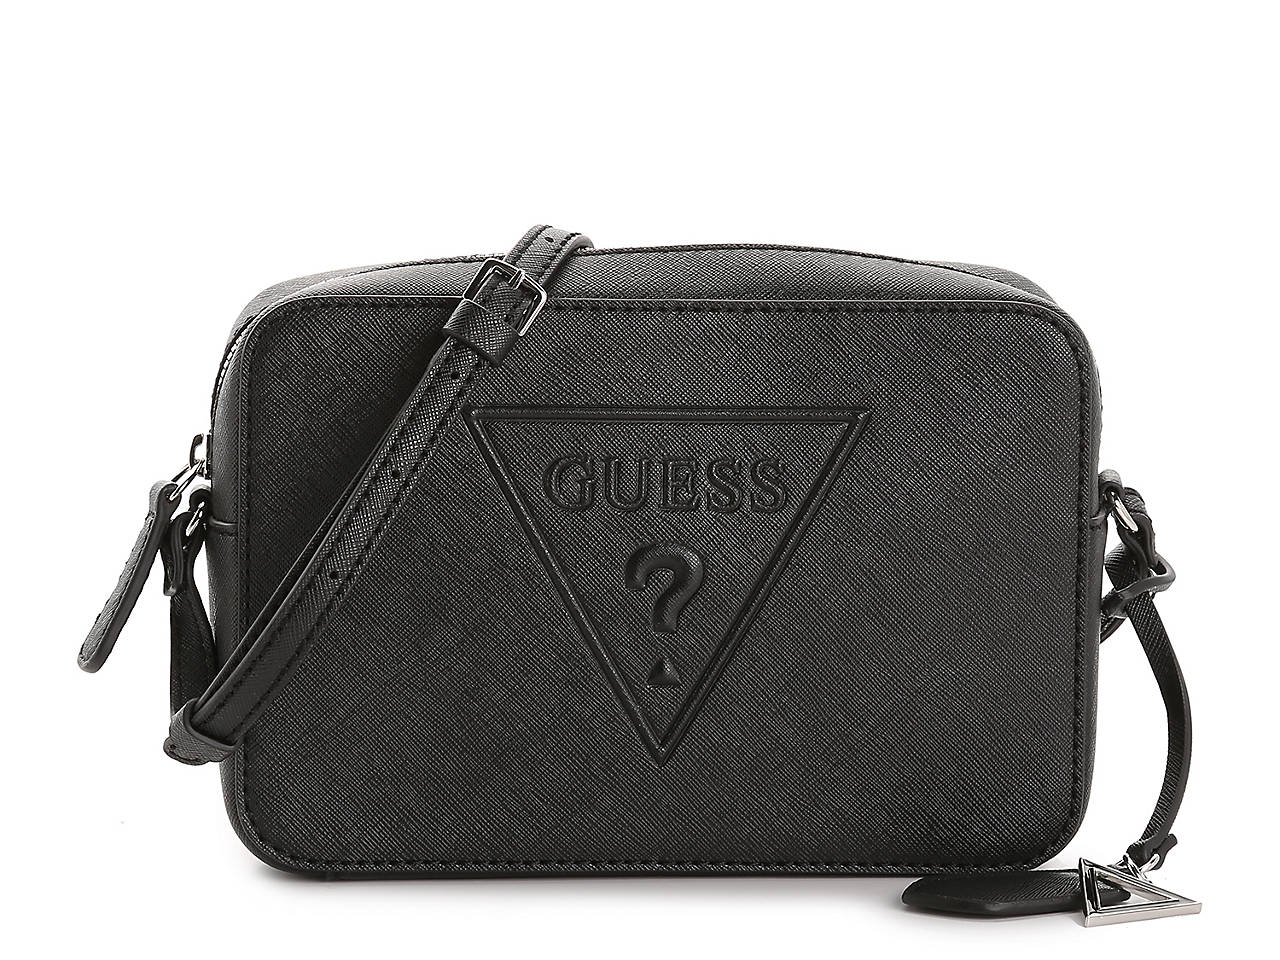 ebf59bd41 Guess Baldwin Park Crossbody Bag Women's Handbags & Accessories | DSW